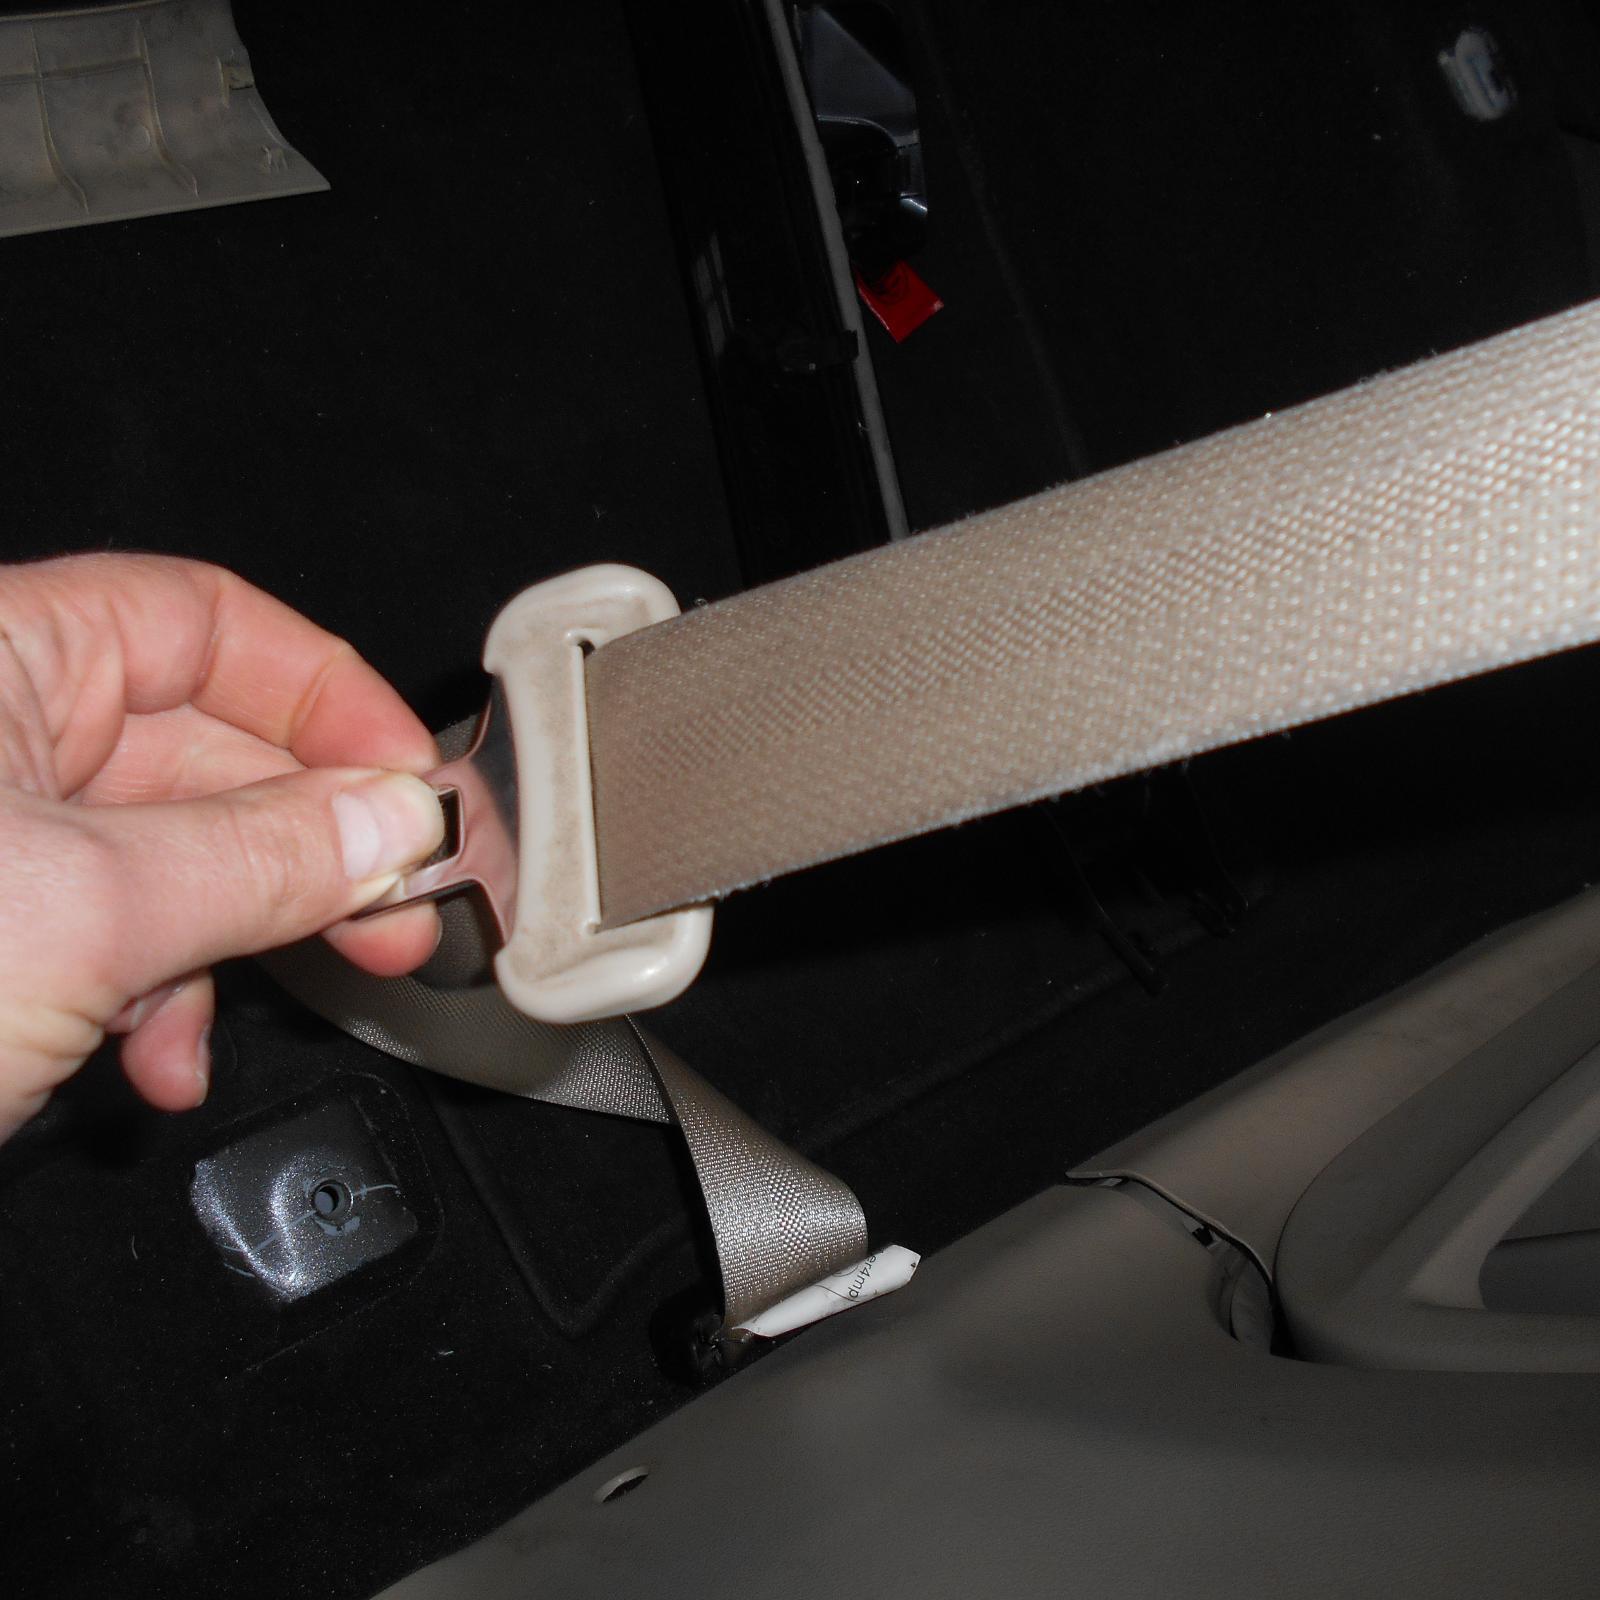 TOYOTA CAMRY, Seatbelt/Stalk, LH FRONT, SEAT BELT STALK ONLY, ASV50/AVV50, 12/11-10/17